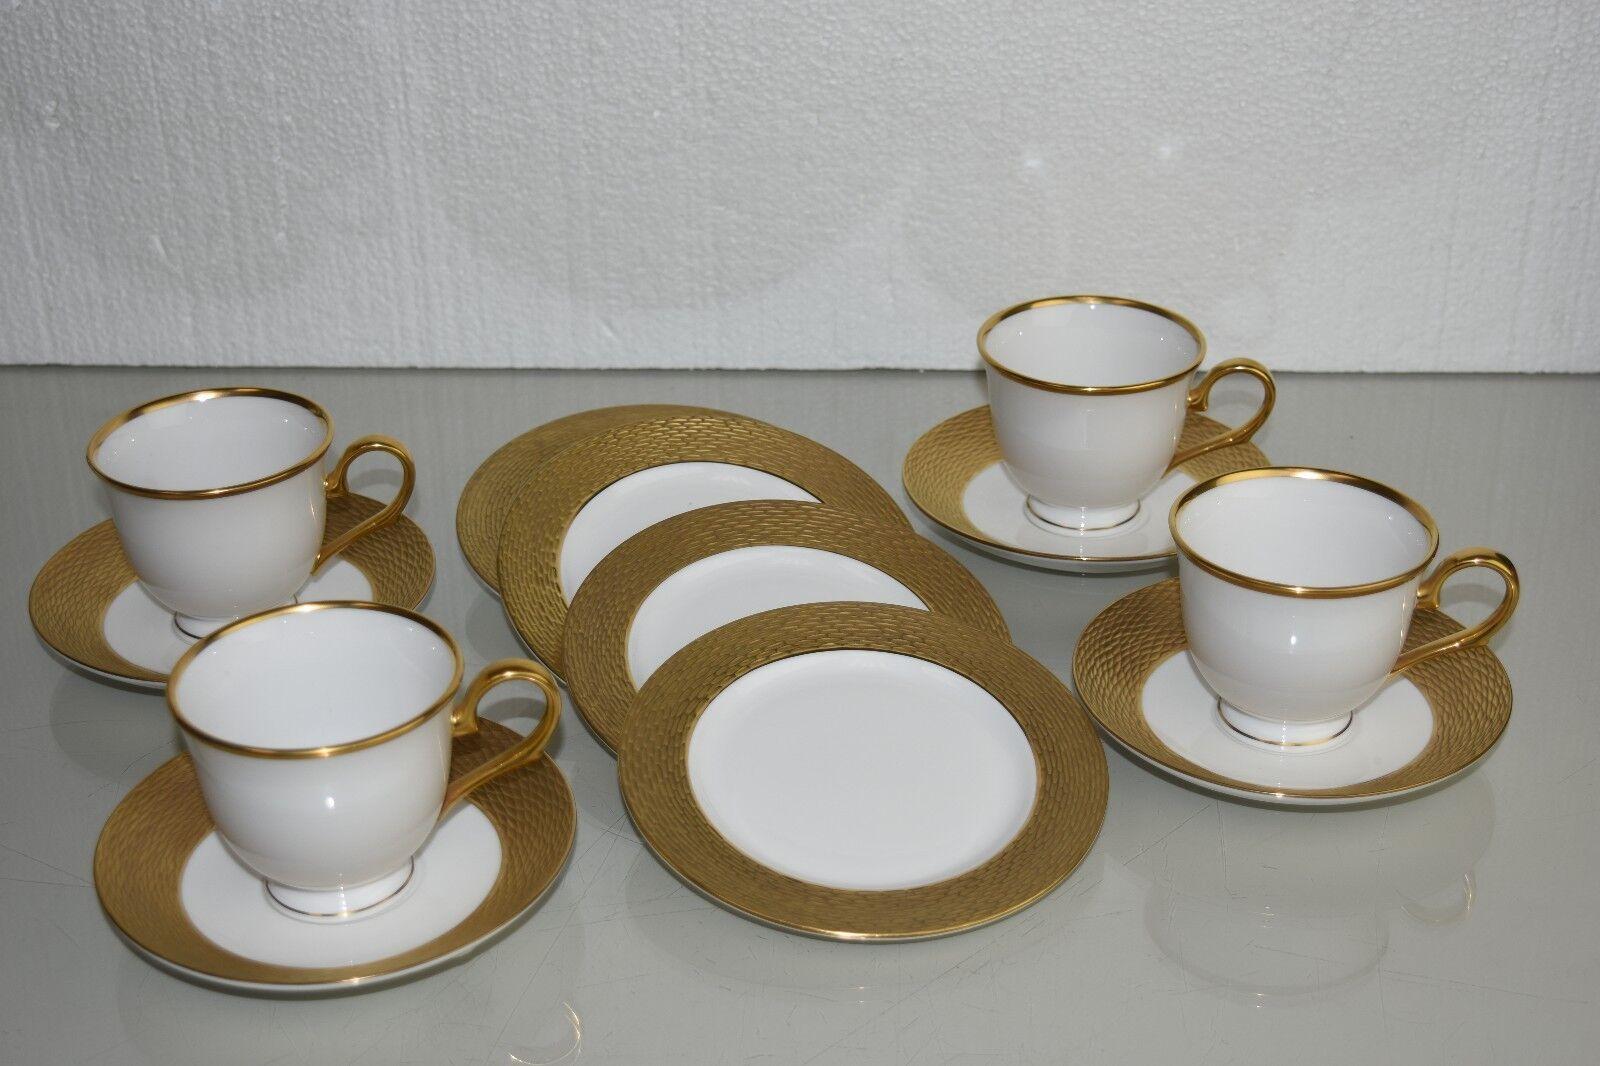 Neu 12 St.Set Fo 4 Lenox Marchesa Mandarin 24K Gold Untertasse Tasse Teller | Verschiedene